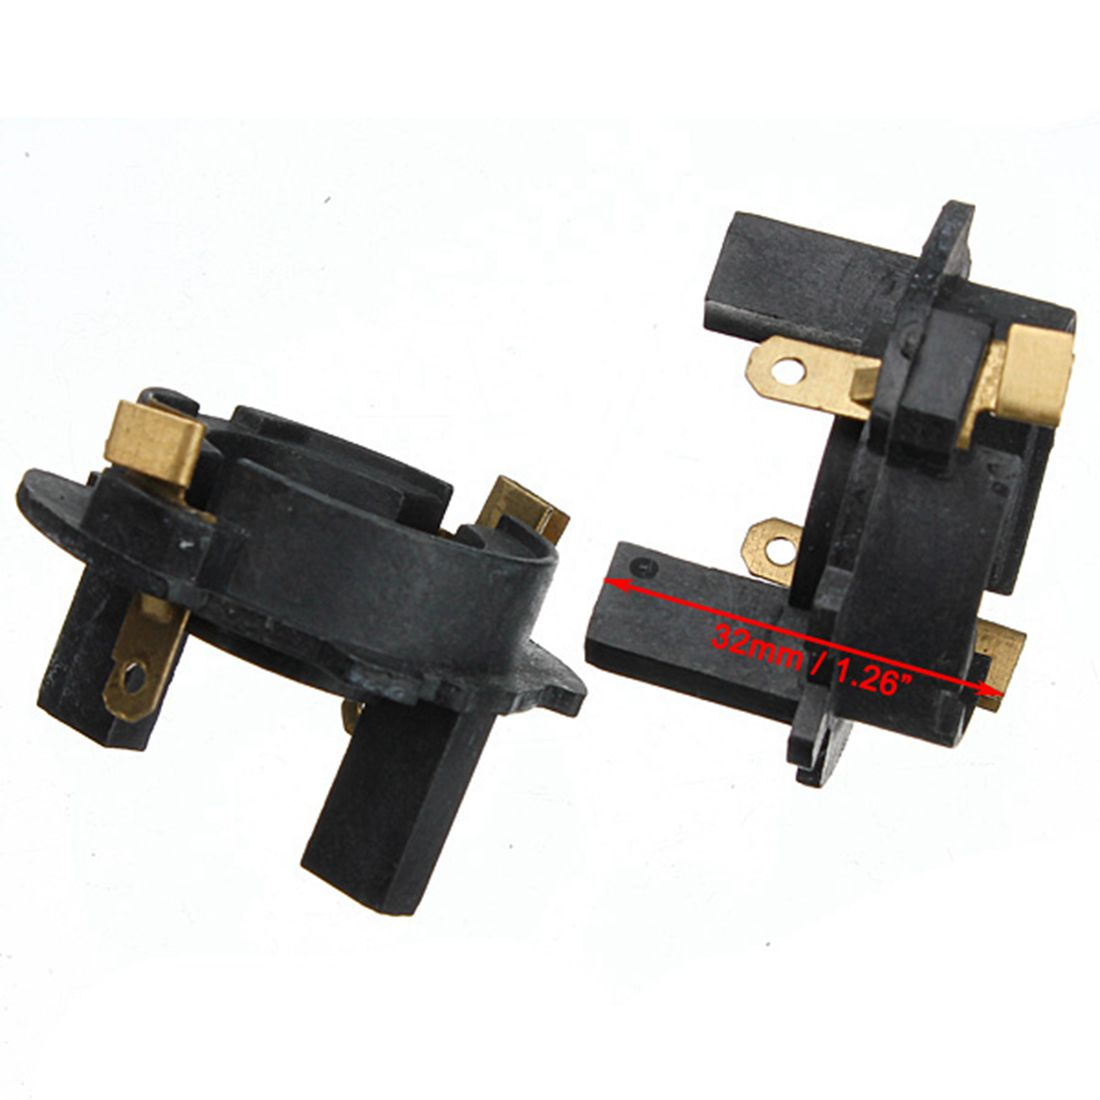 Par Adaptador para Lâmpada Xenon H7 Jetta Tiguan Até 2010  - BEST SALE SHOP